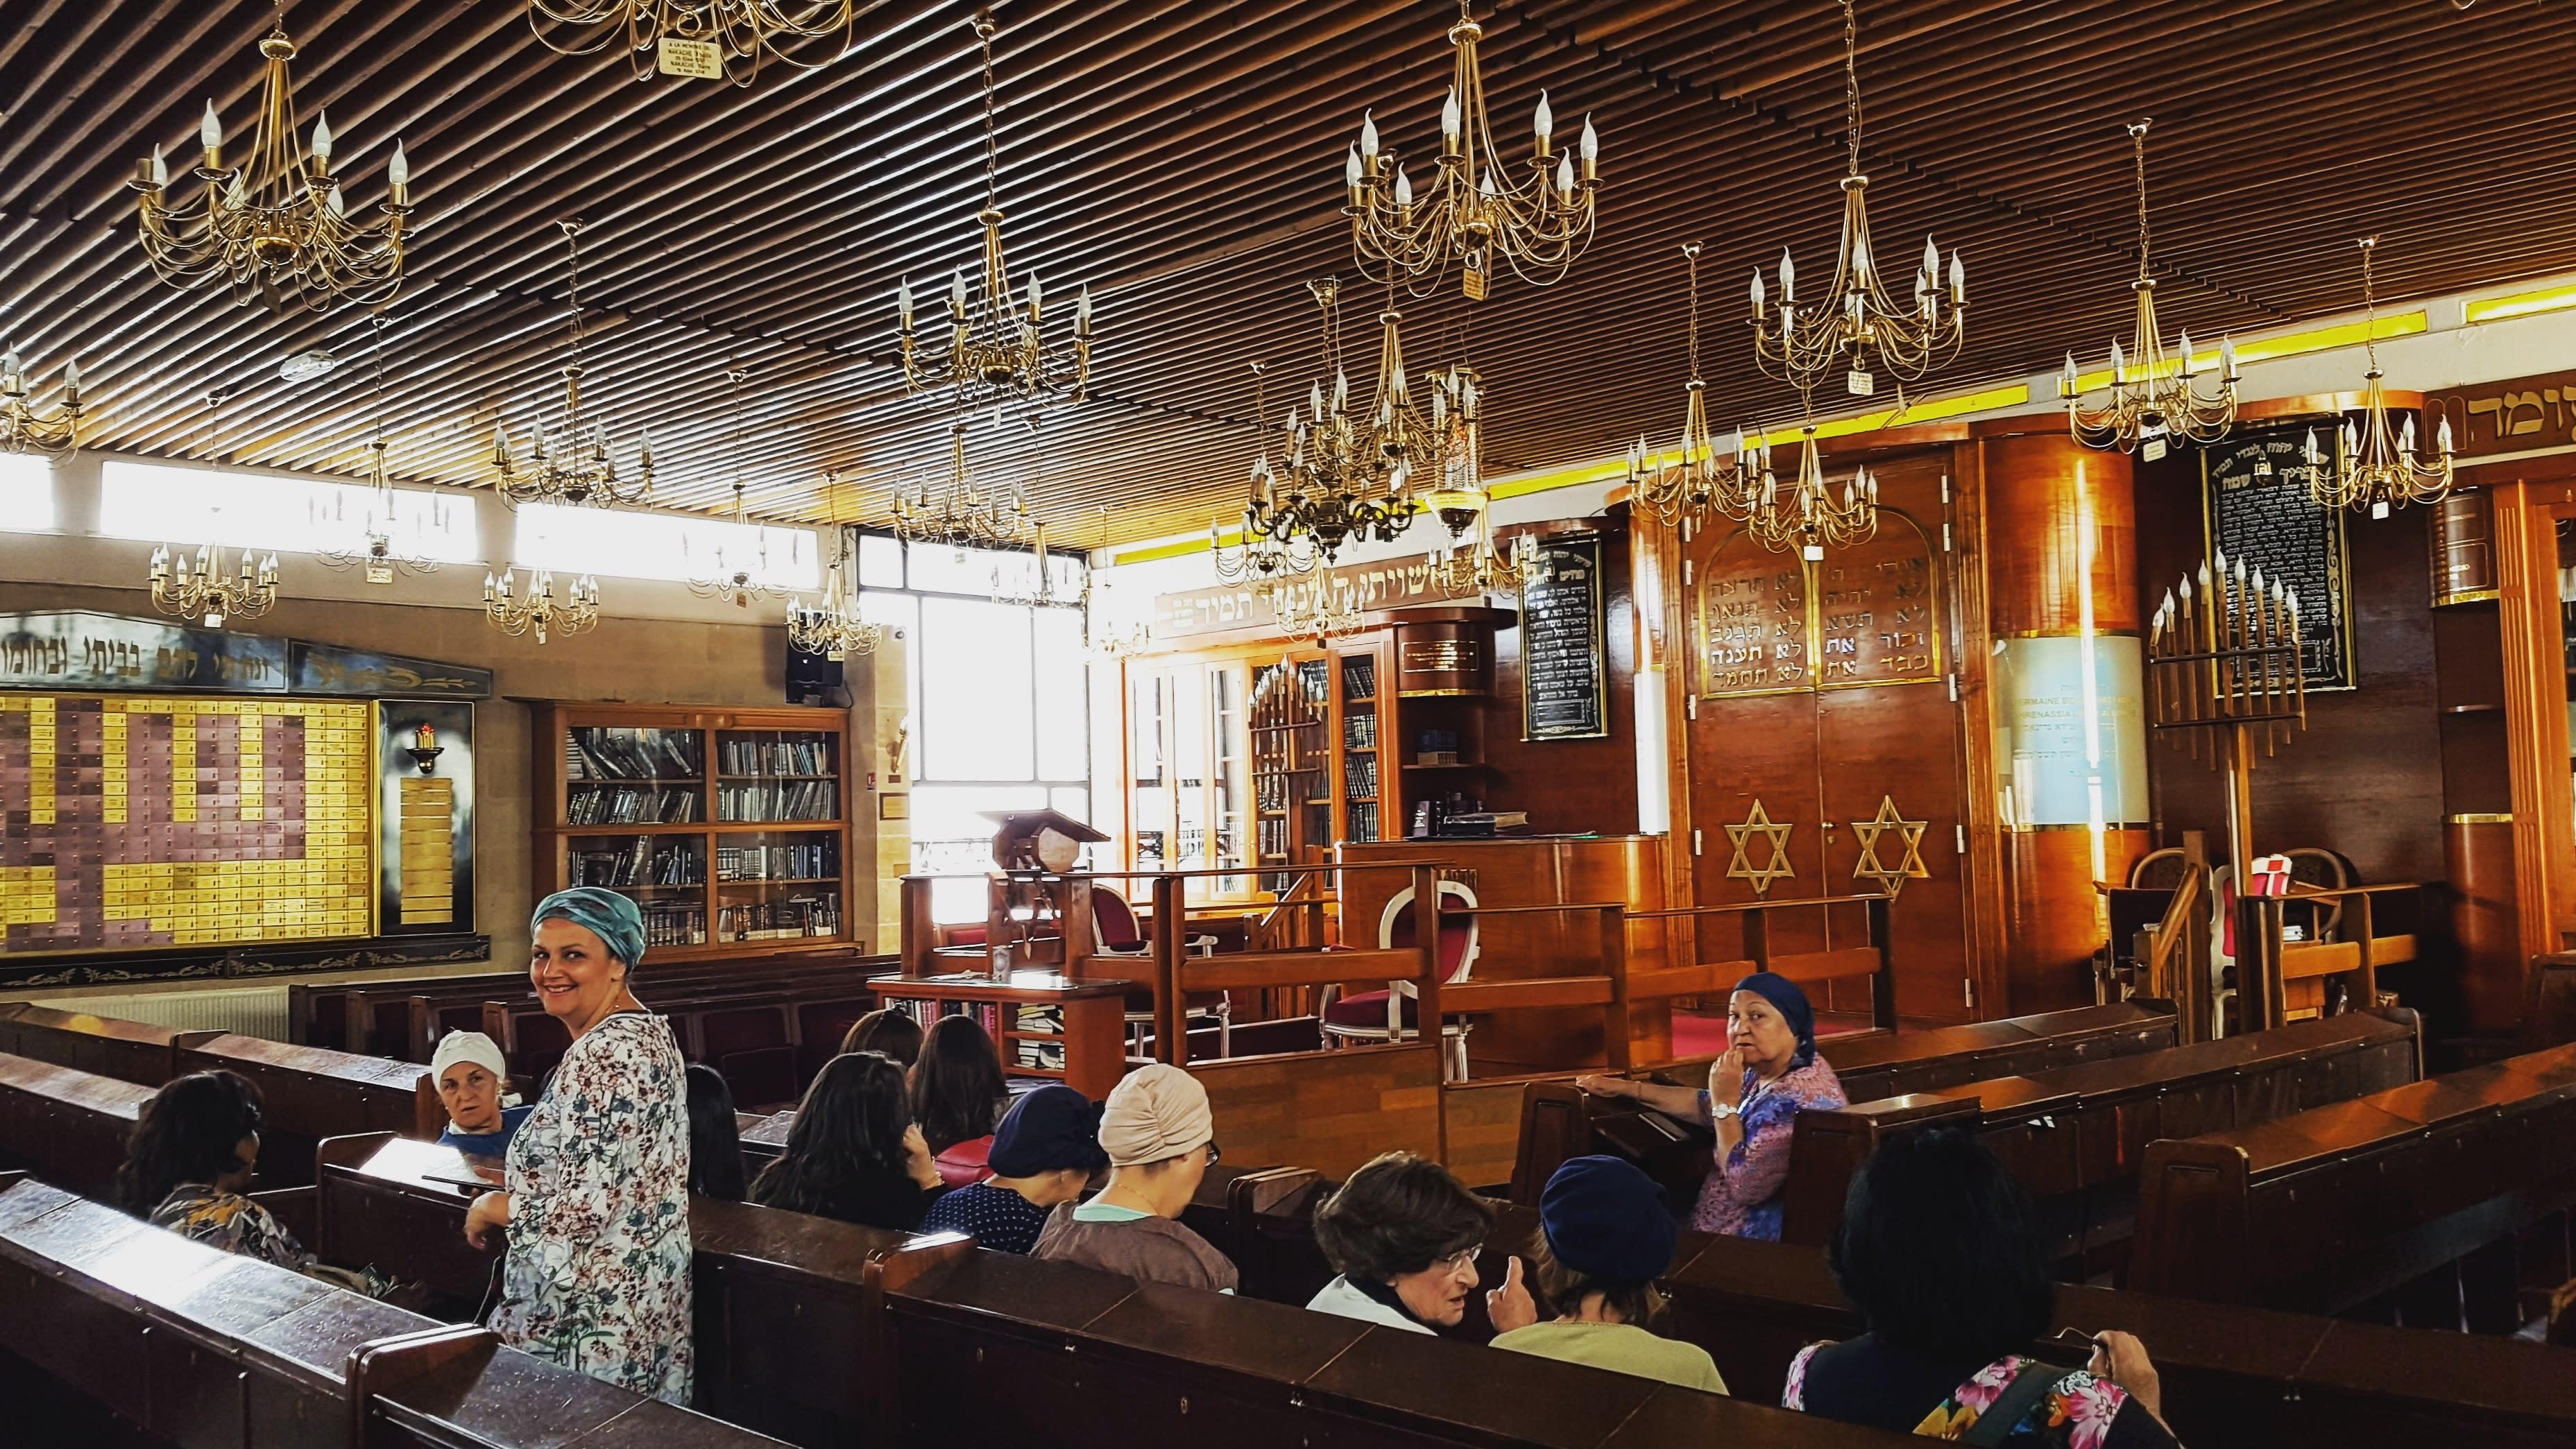 Confort Bain Design Bois Guillaume diaspora affairs: the reality of antisemitism in france